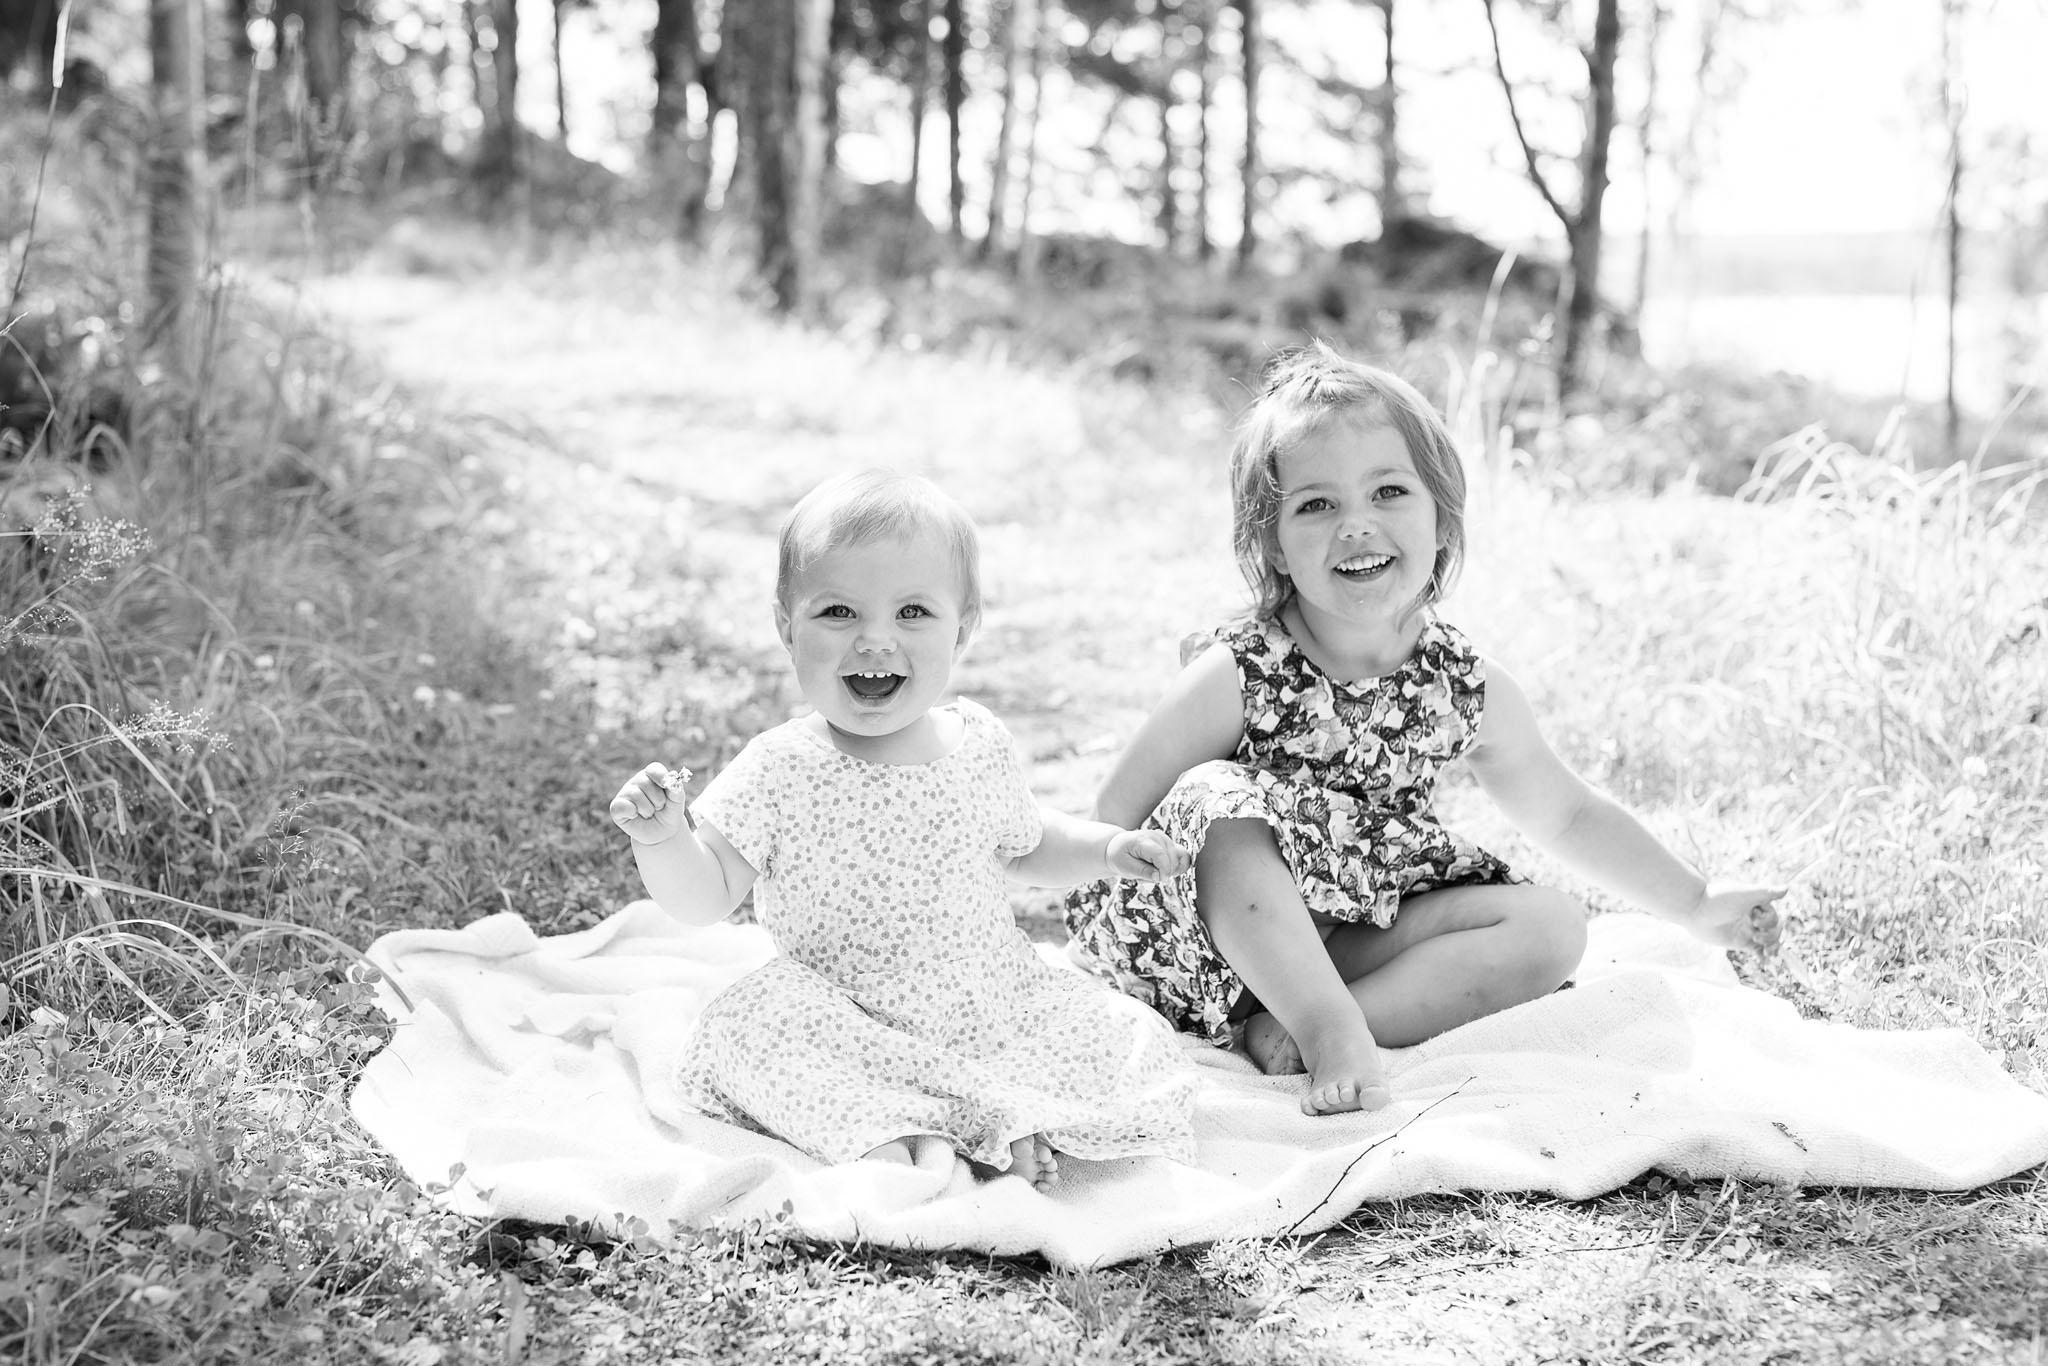 fotograf_sabina_wixner_barn_familj_hudiksvall_2.jpg